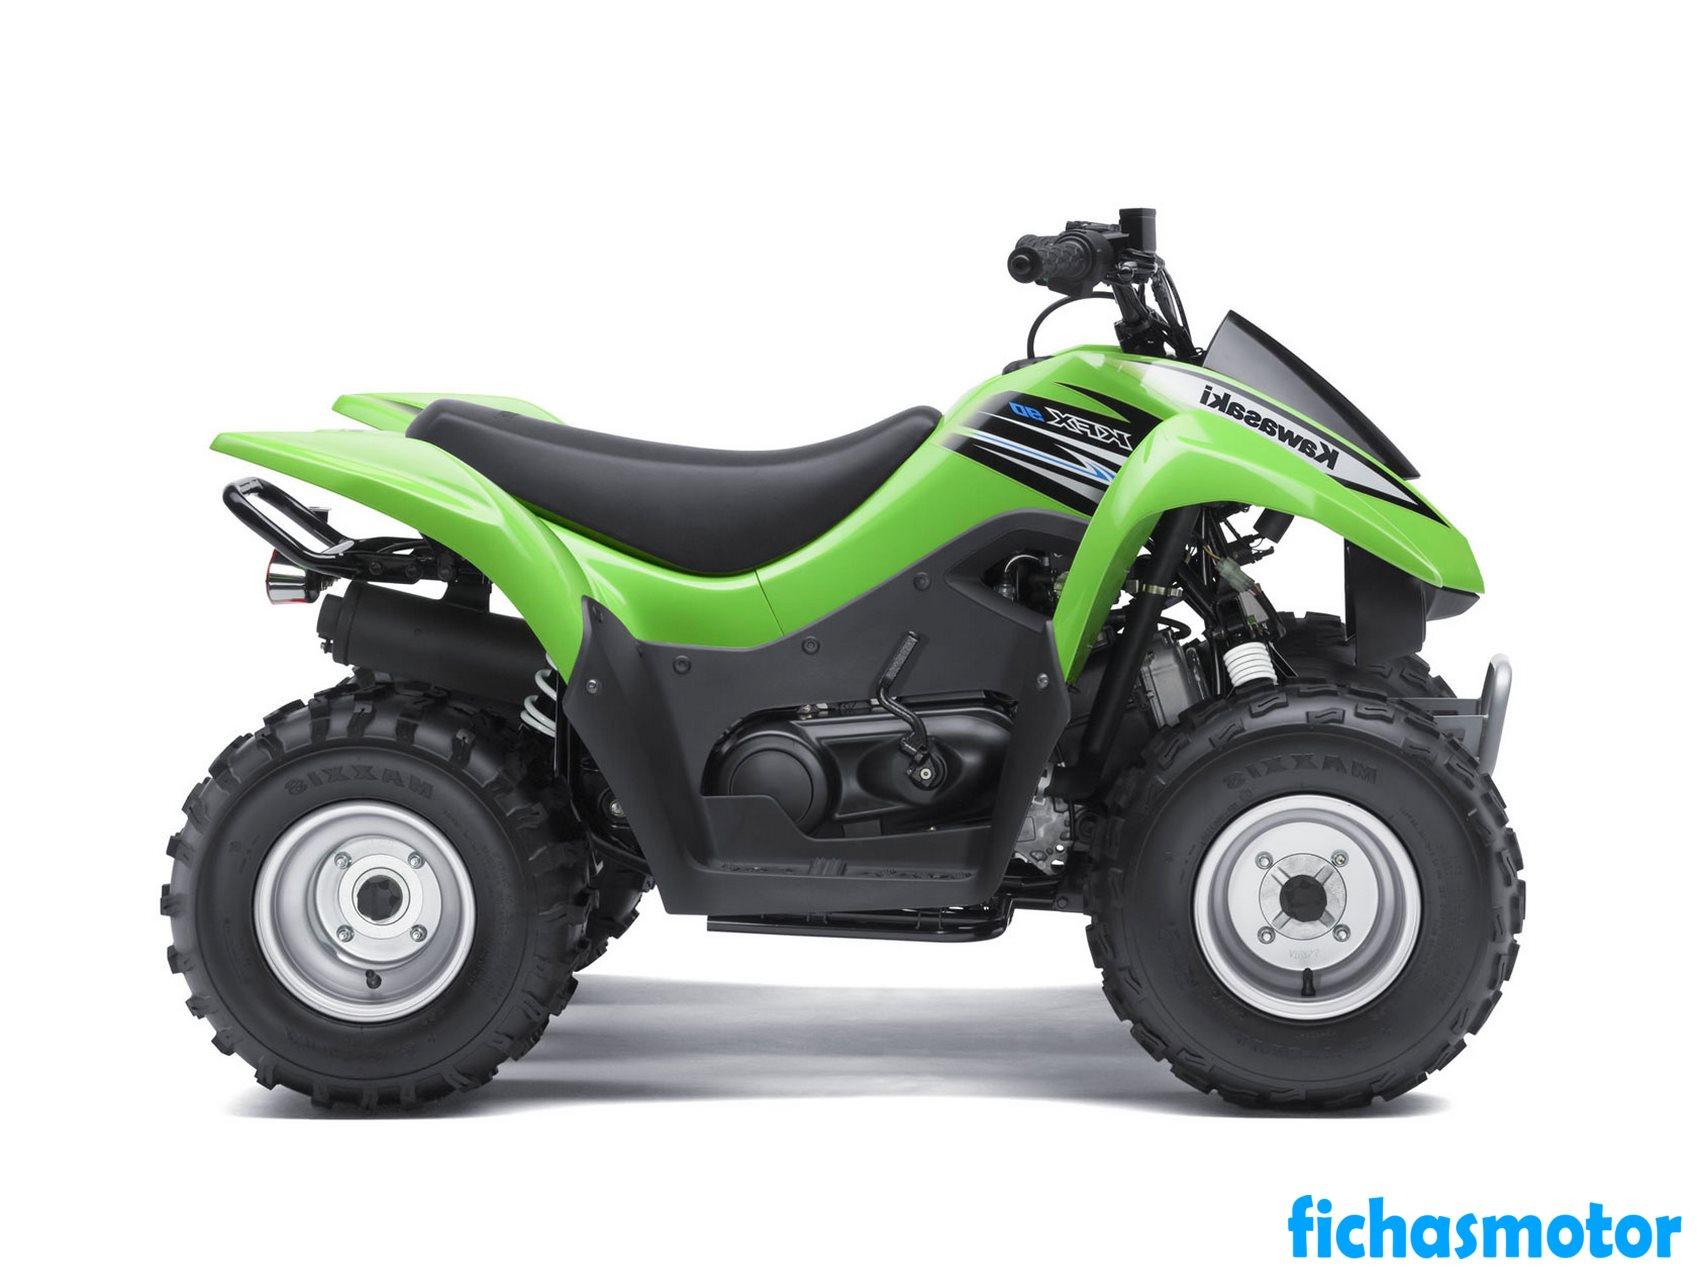 Imagen moto Kawasaki kfx 90 año 2011